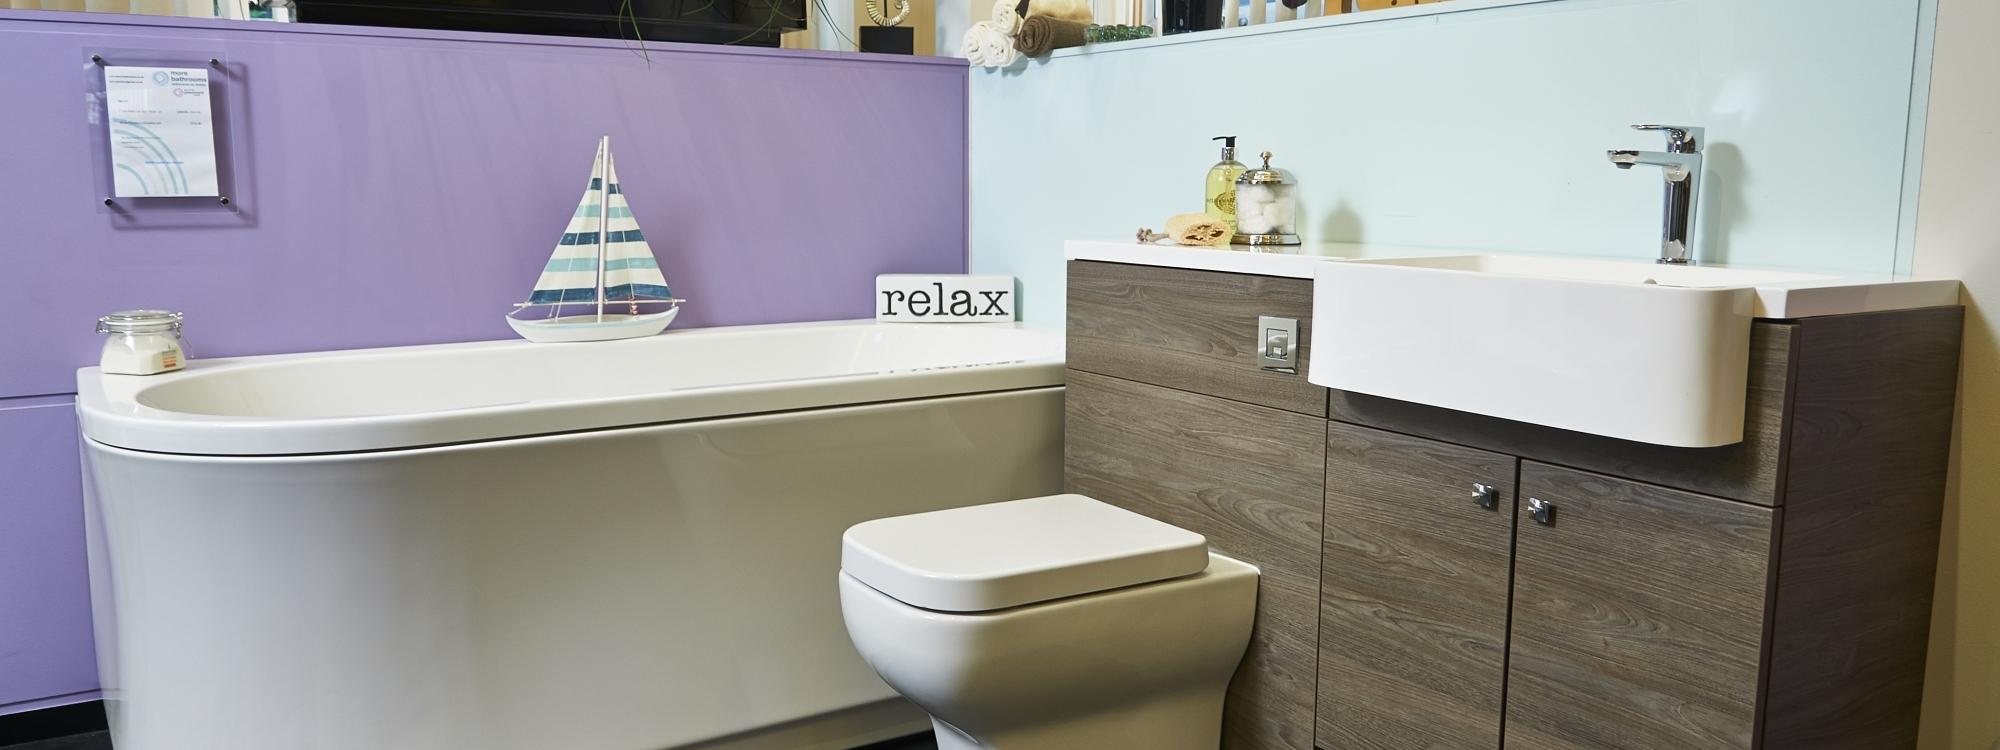 Visit More Bathrooms Showroom Leeds West Yorkshire